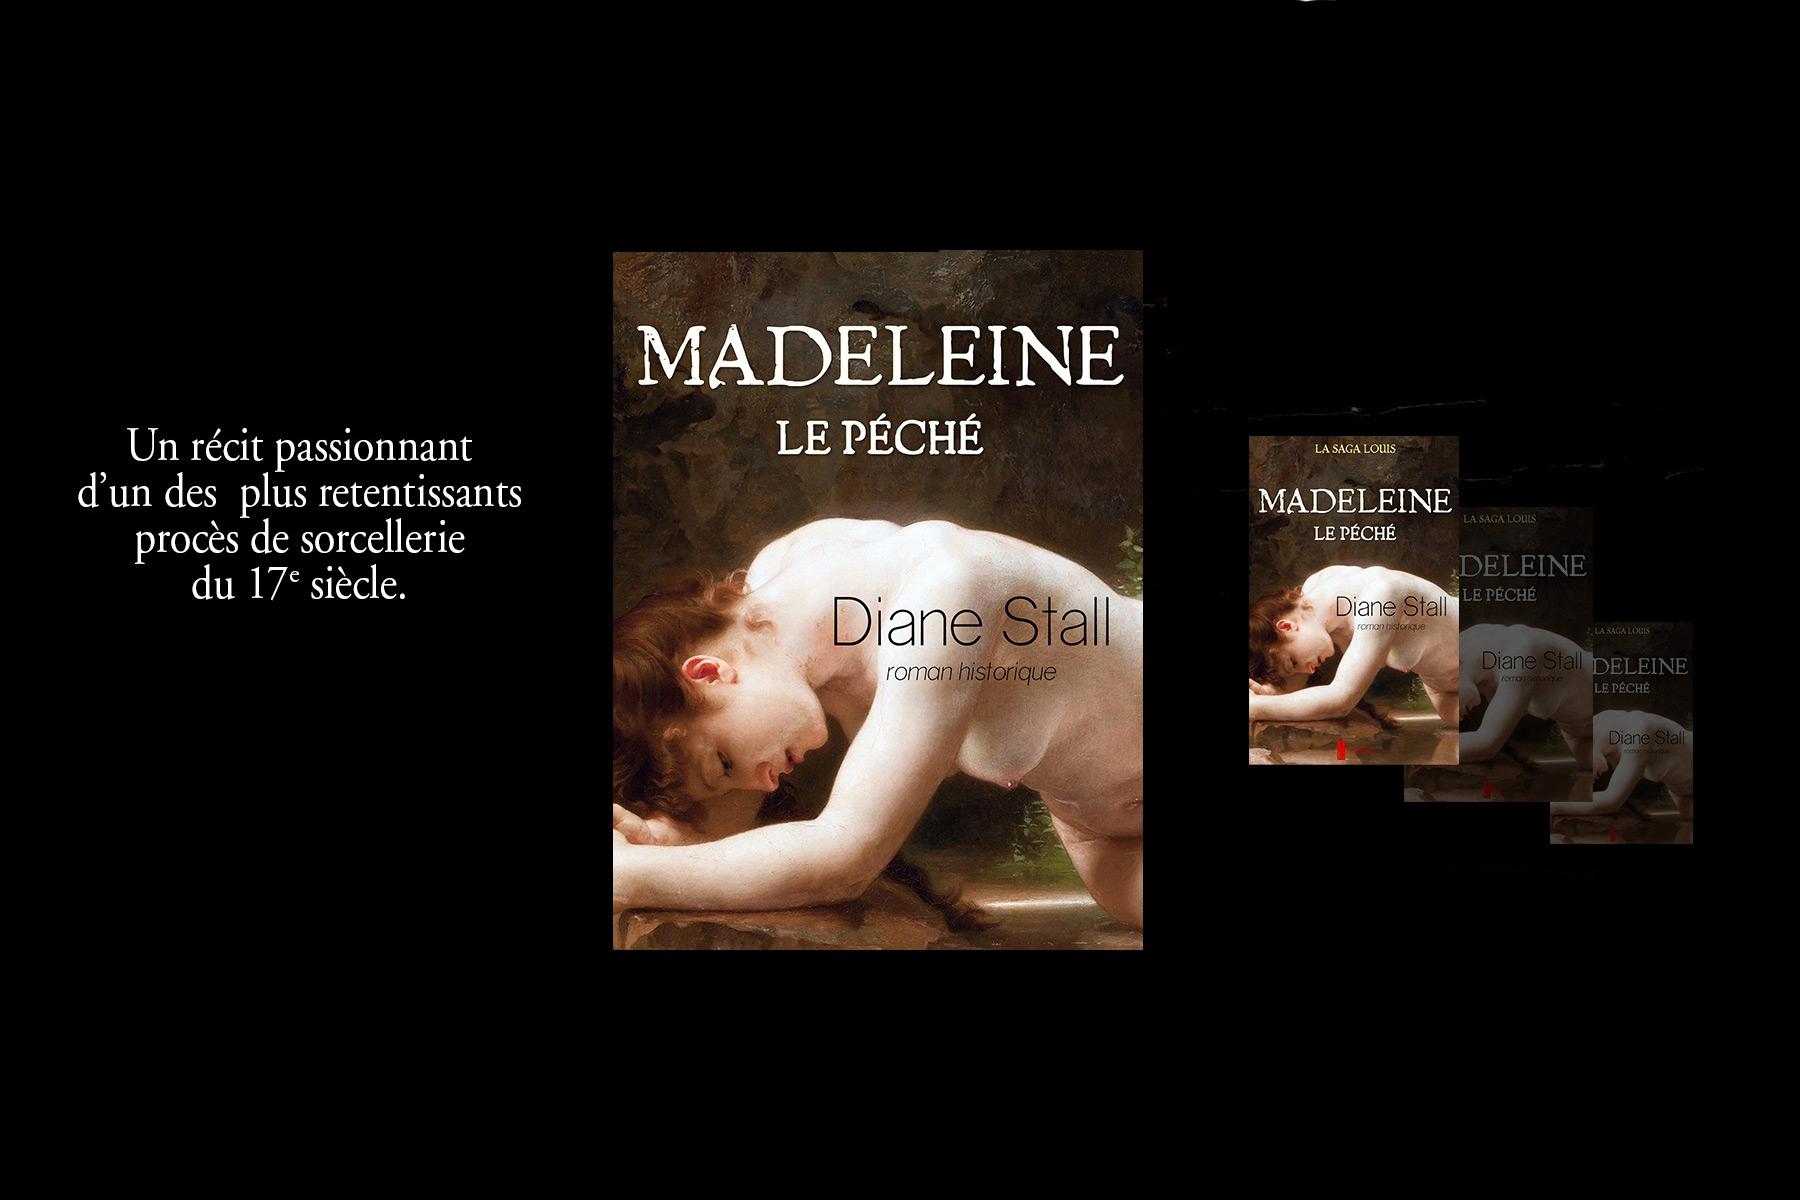 Madeleine-le-peche-login-bk